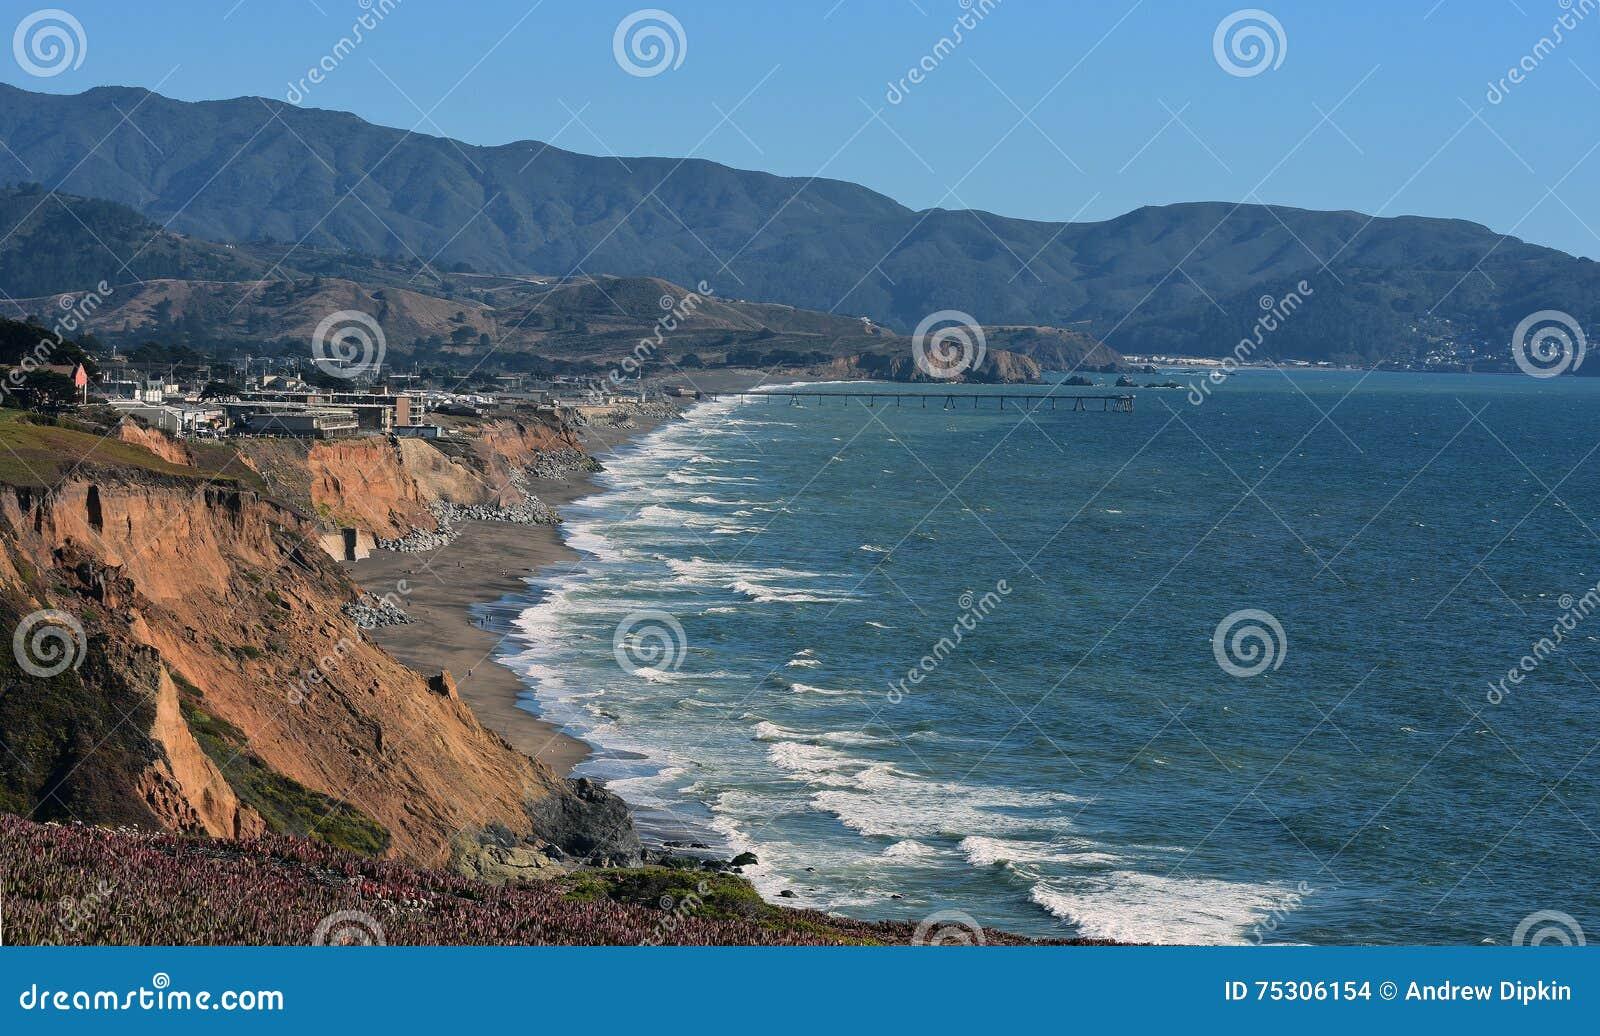 Pacific Coast, Pacifica California Stock Photo - Image of energy